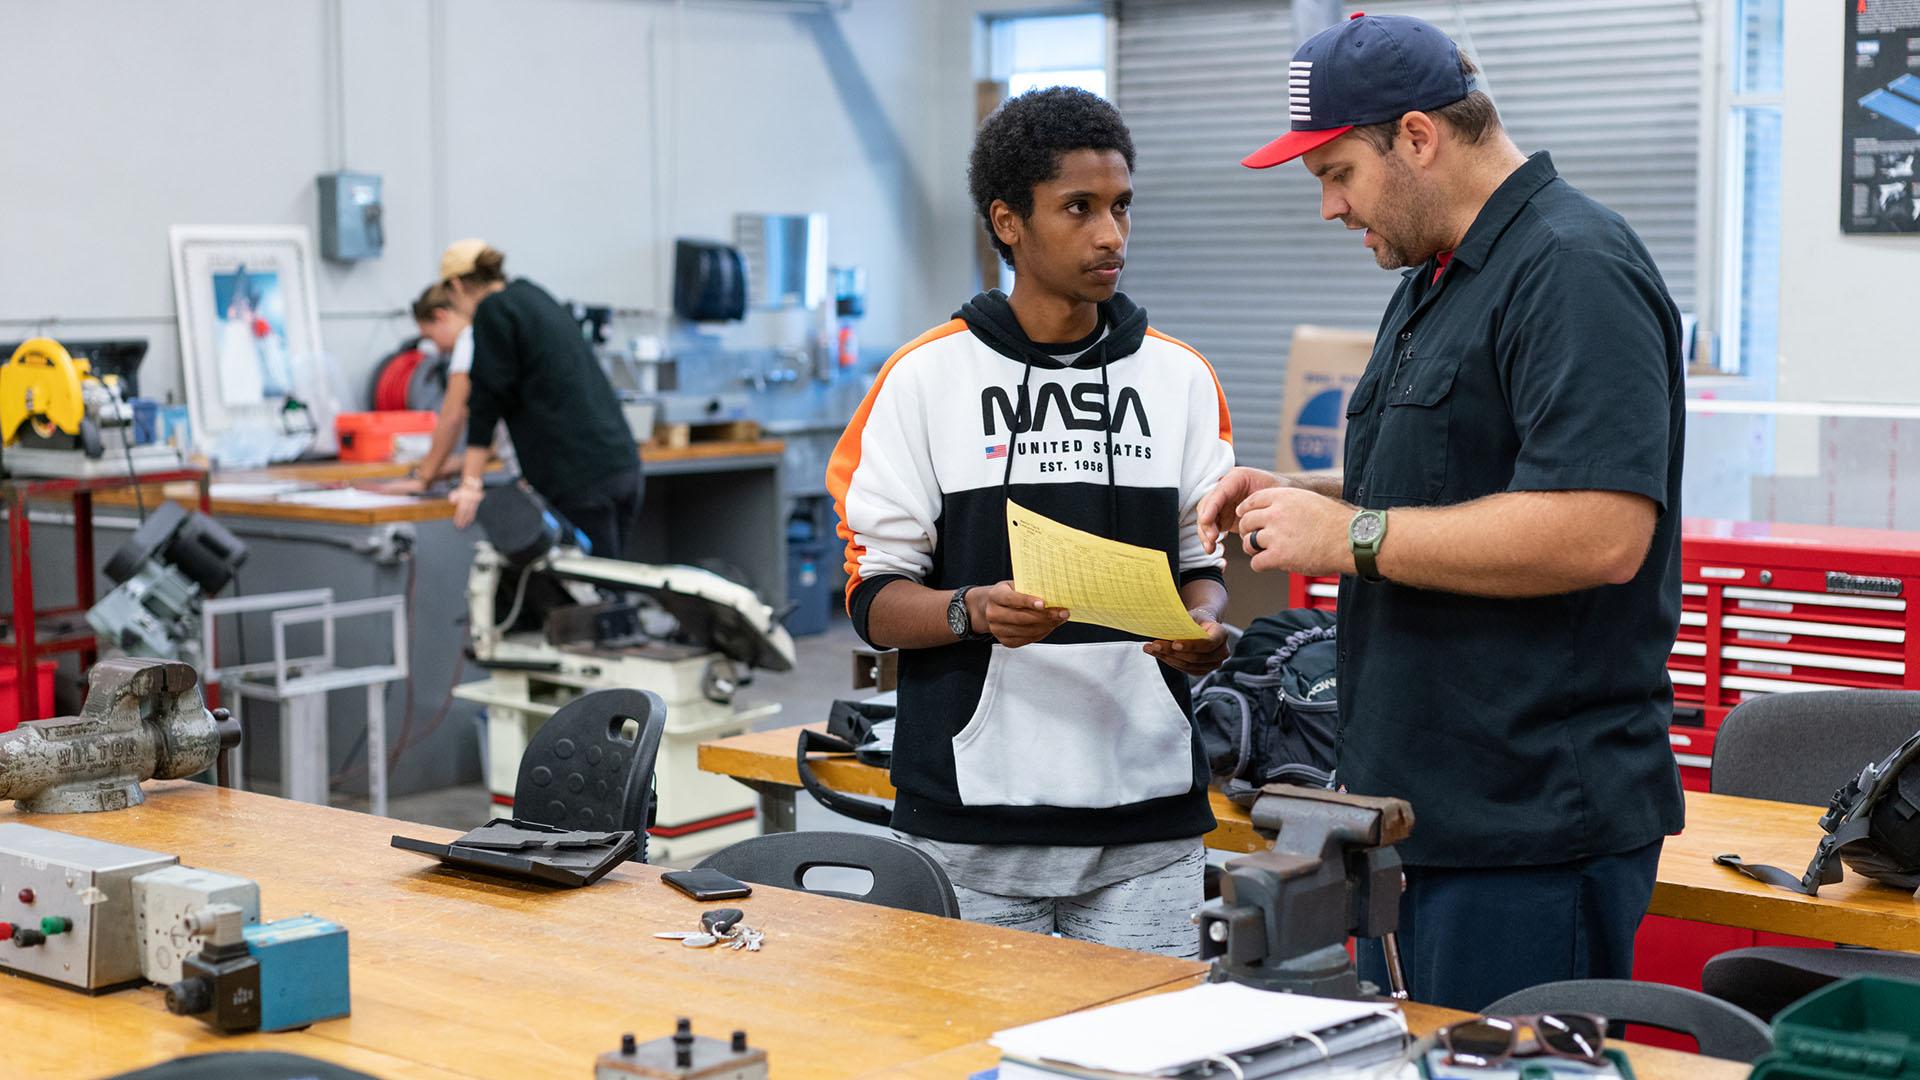 EFSC Aerospace Technology Lab